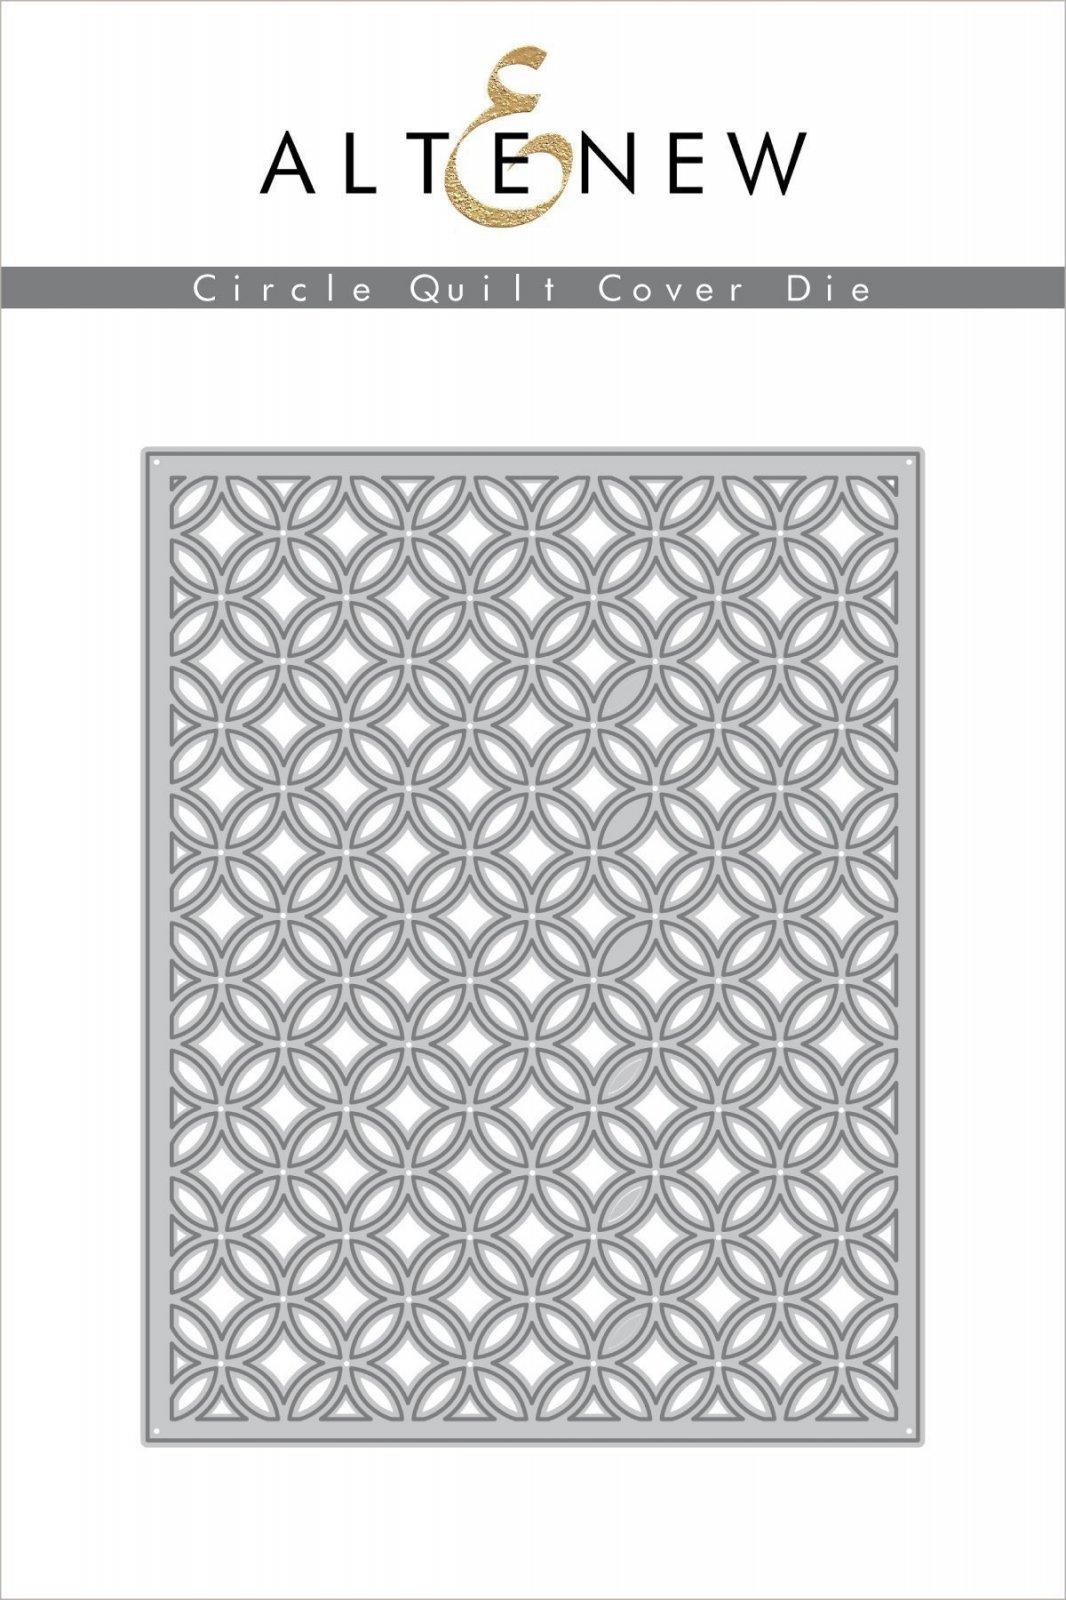 Altenew - Circle Quilt Cover Die